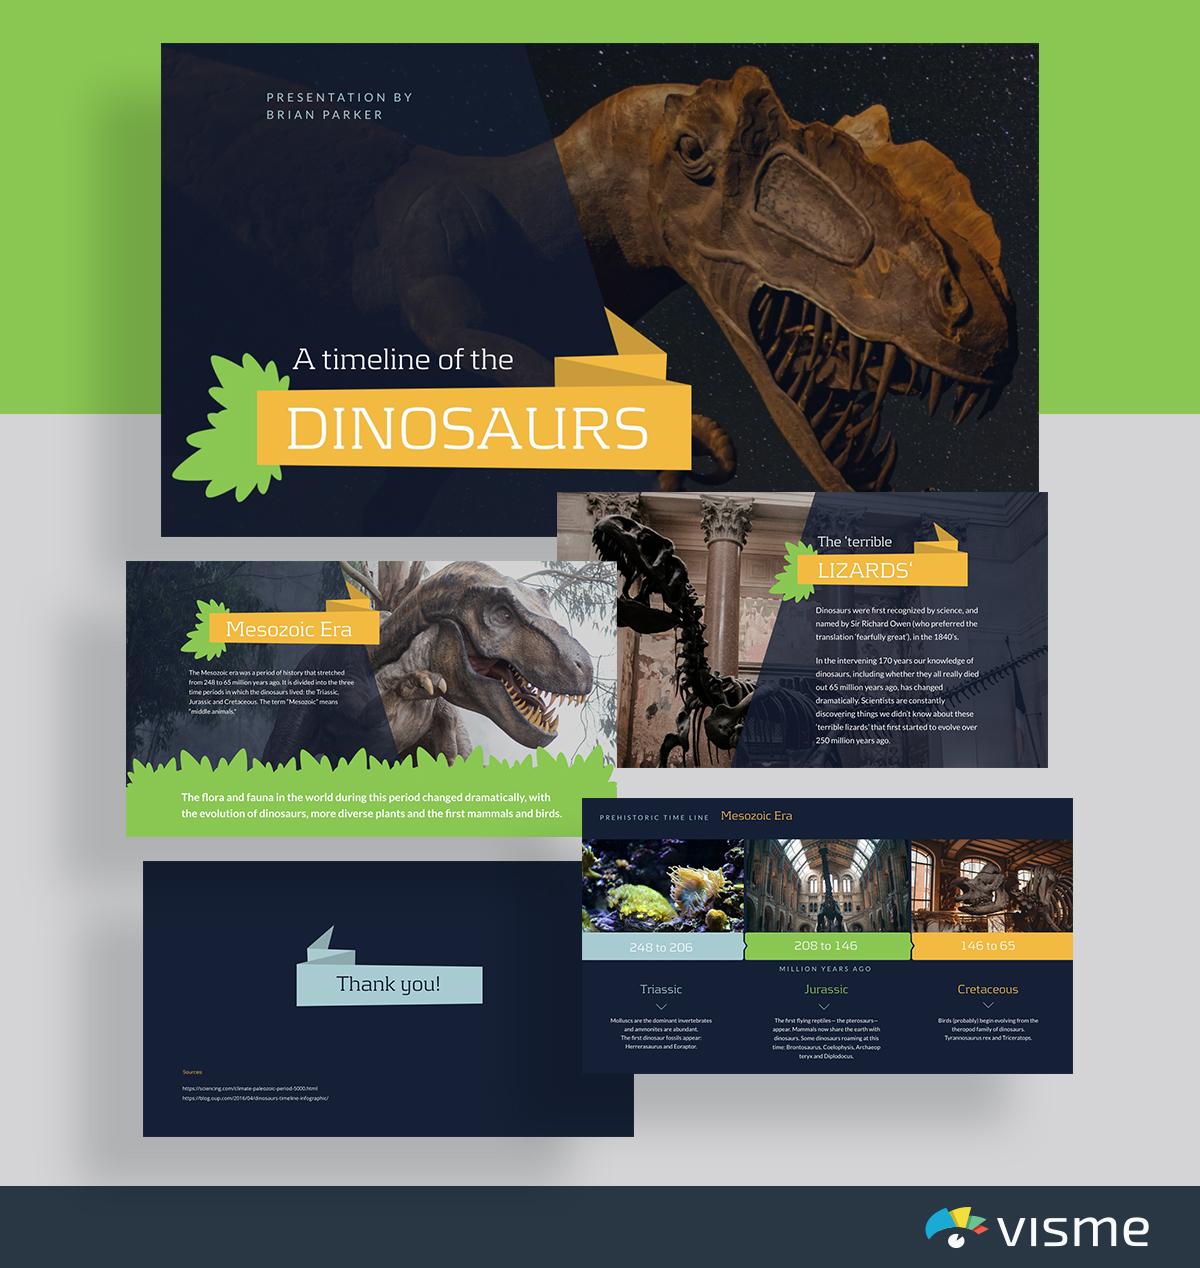 presentation topic ideas - prehistoric timeline dinosaurs history presentation template visme